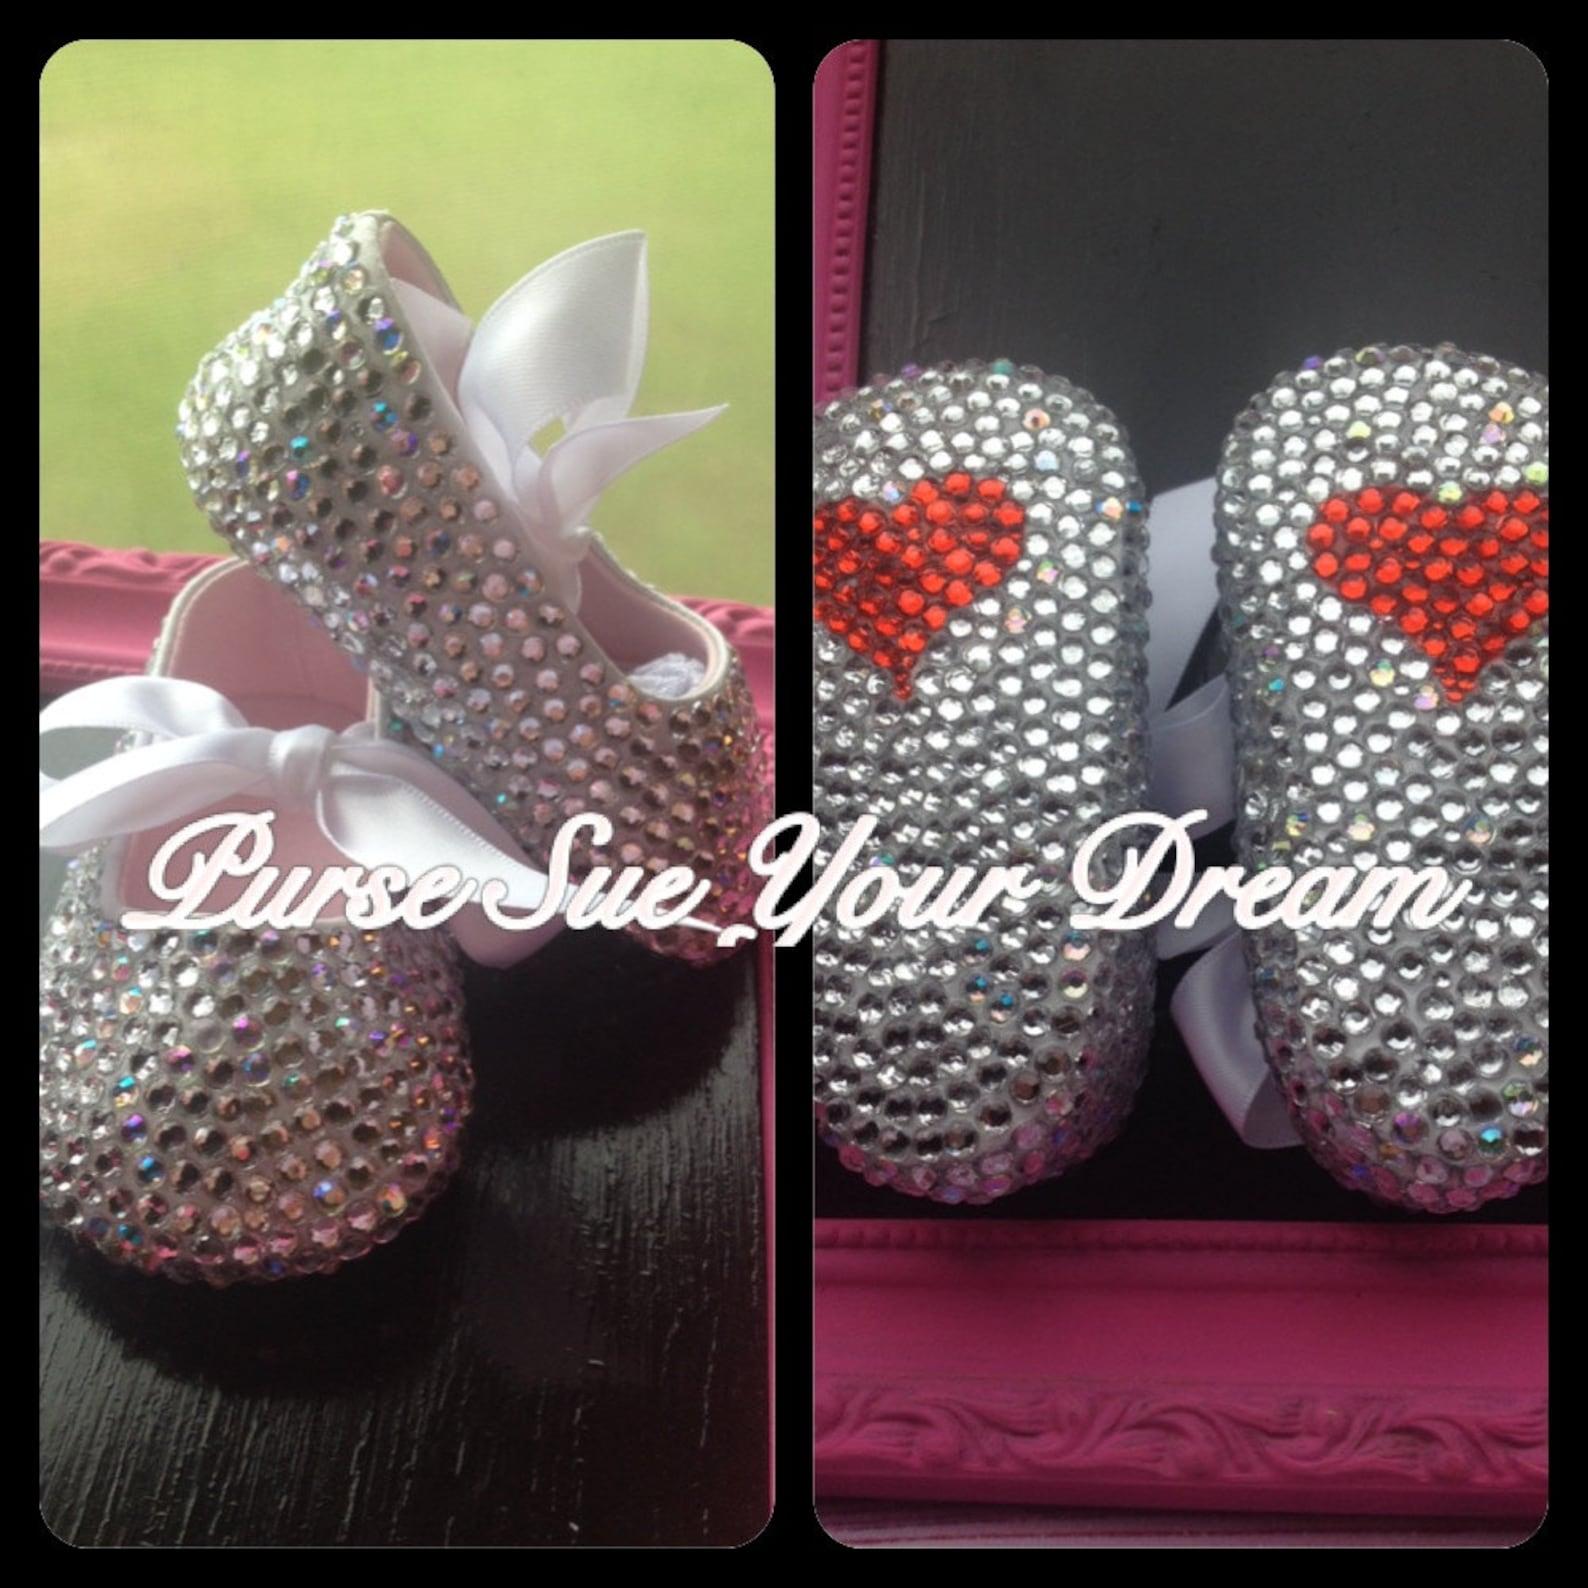 crystal rhinestone infant size ballet shoes - swarovski shoes - christening/baptism/pageant/wedding shoes - advertisement listin